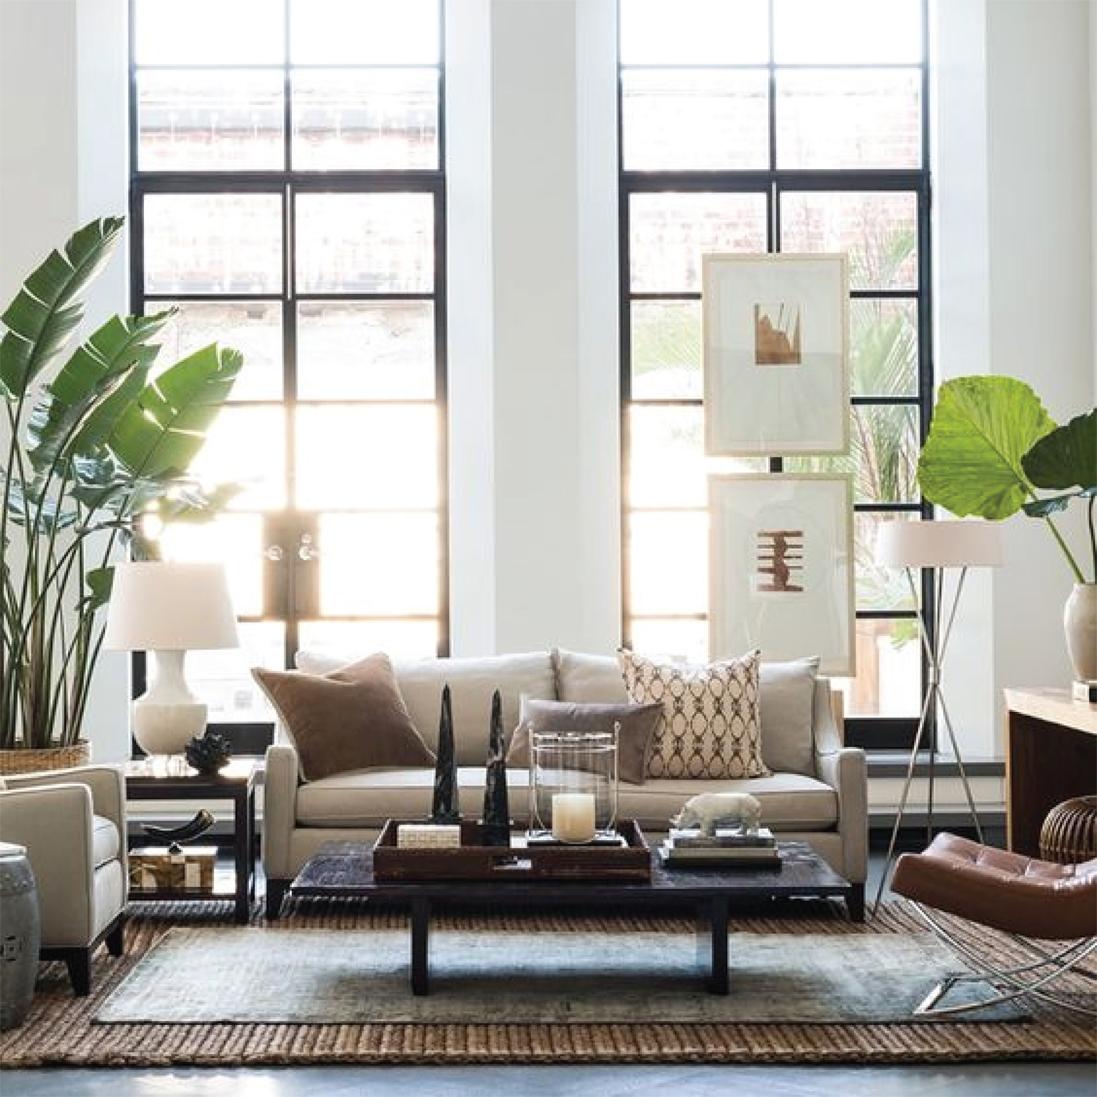 Fresh greenery | Living room design